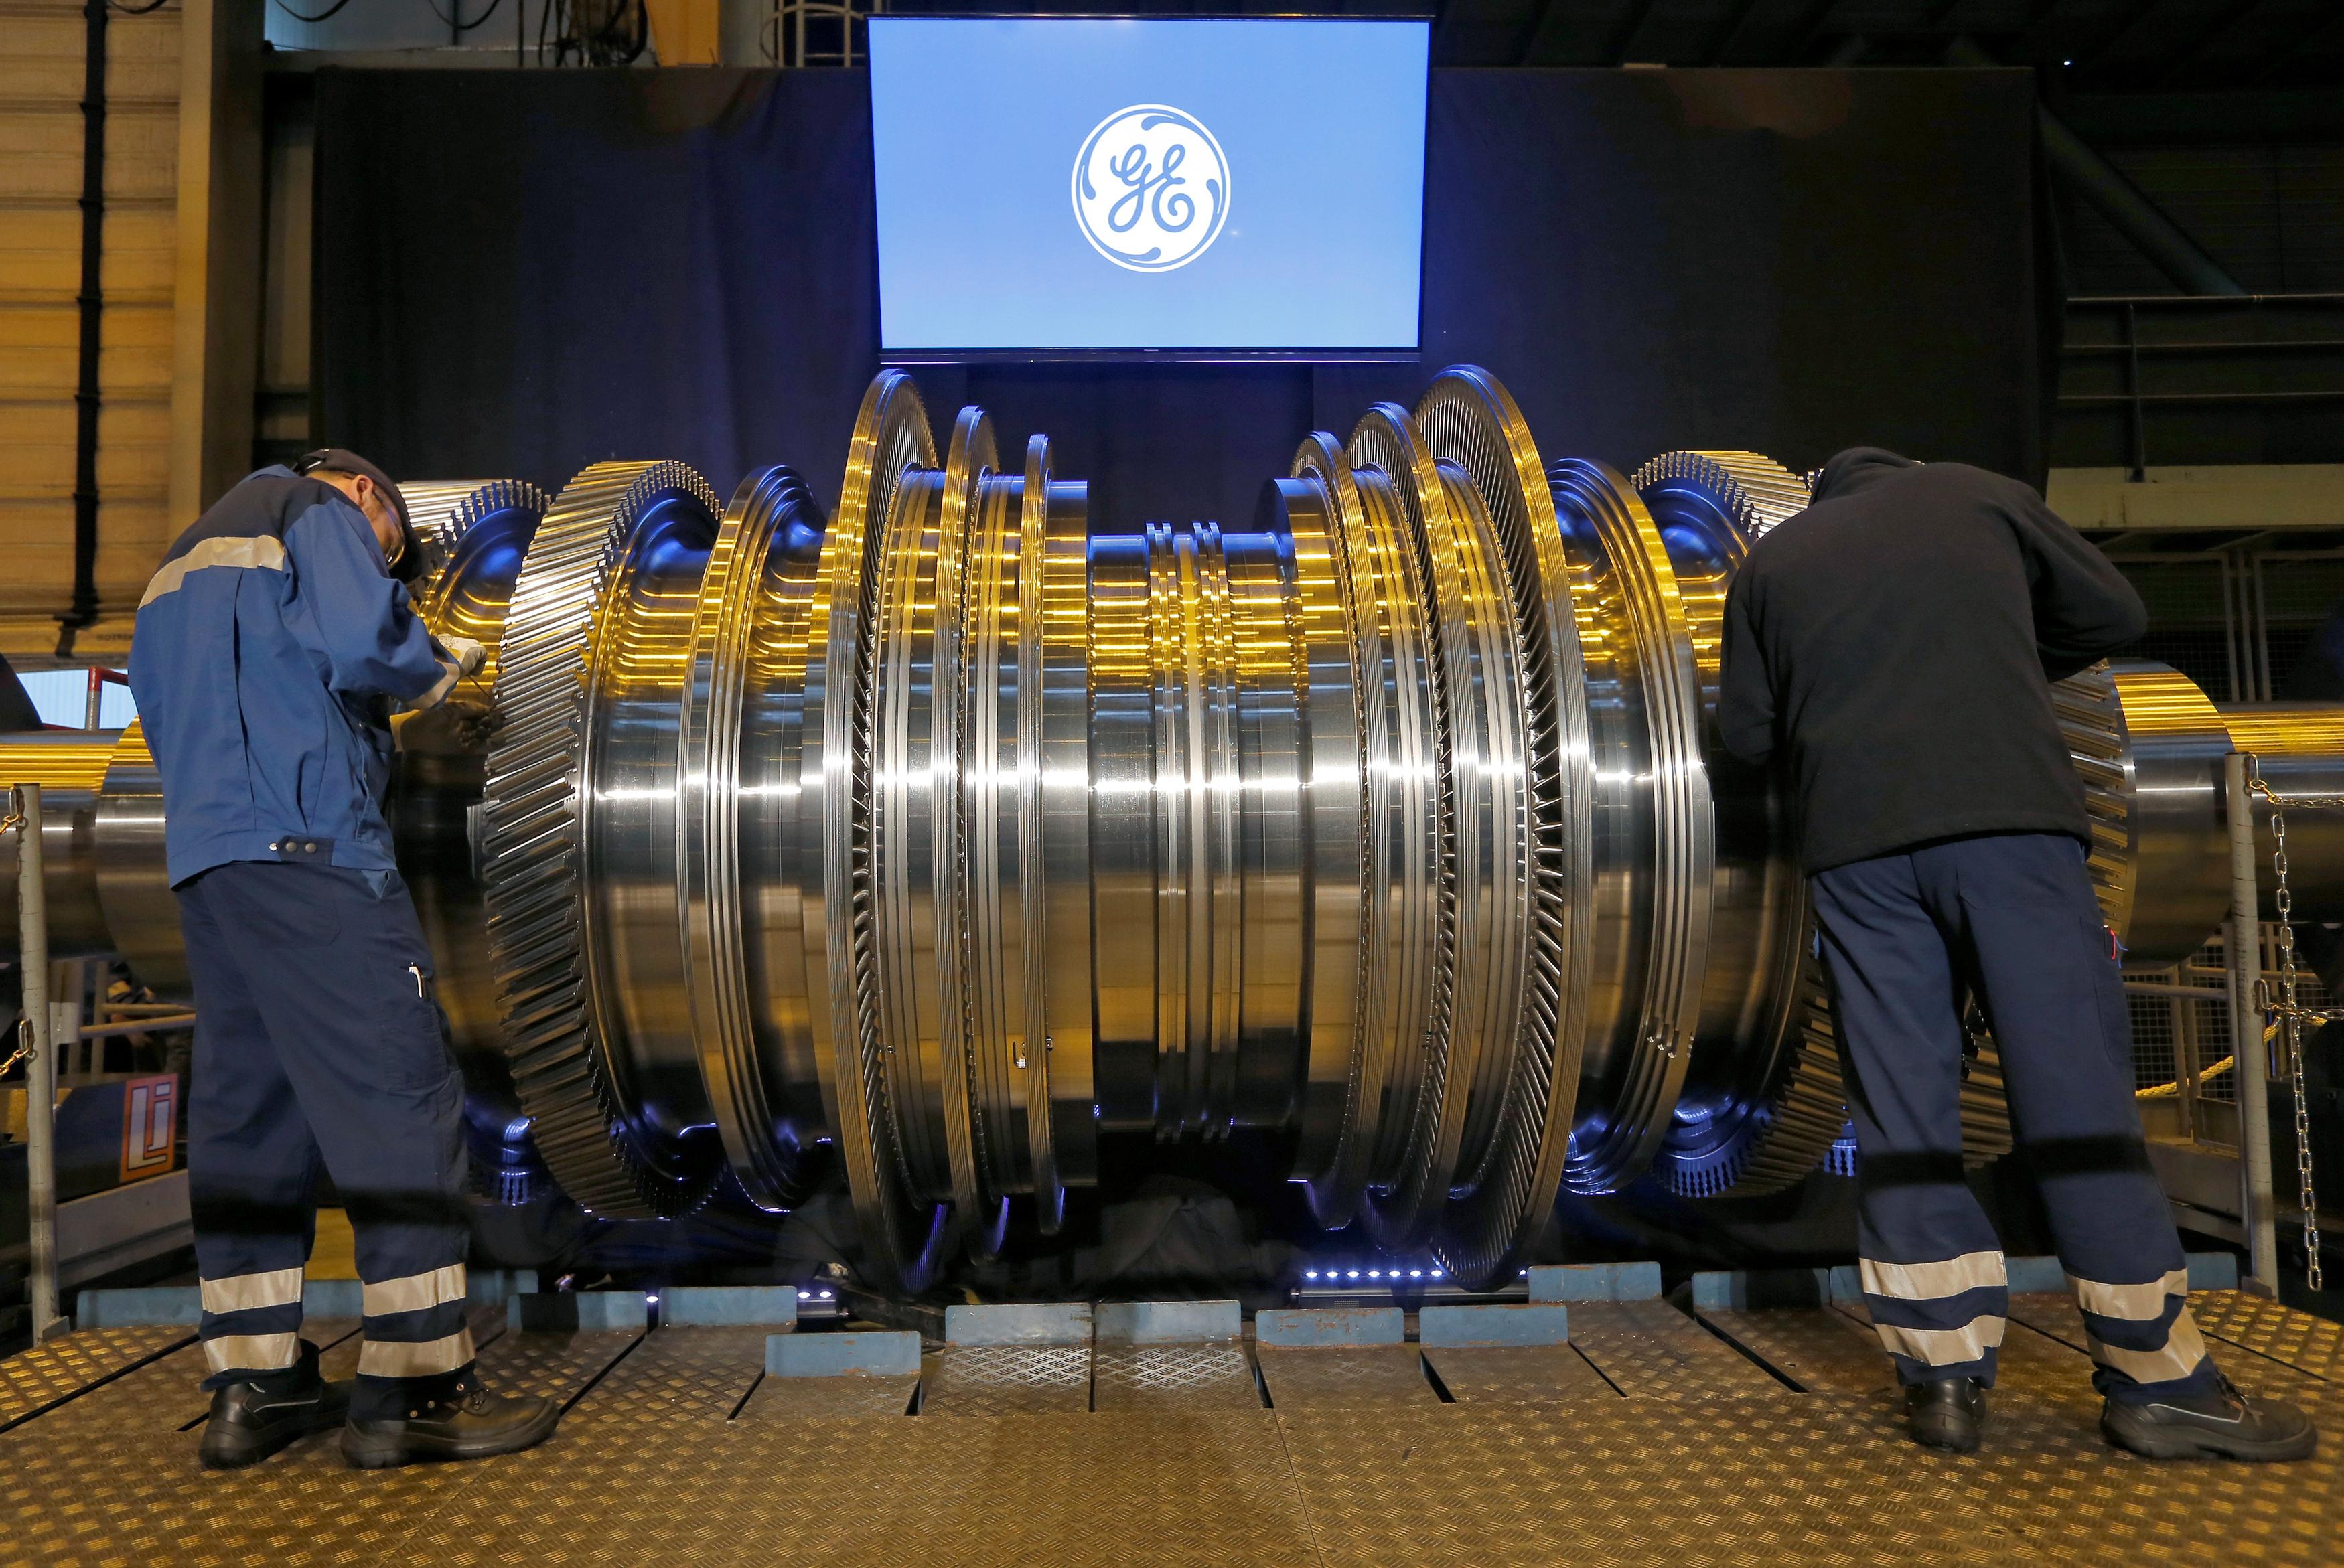 Plan social à Belfort : General Electric n'a pas de plan B